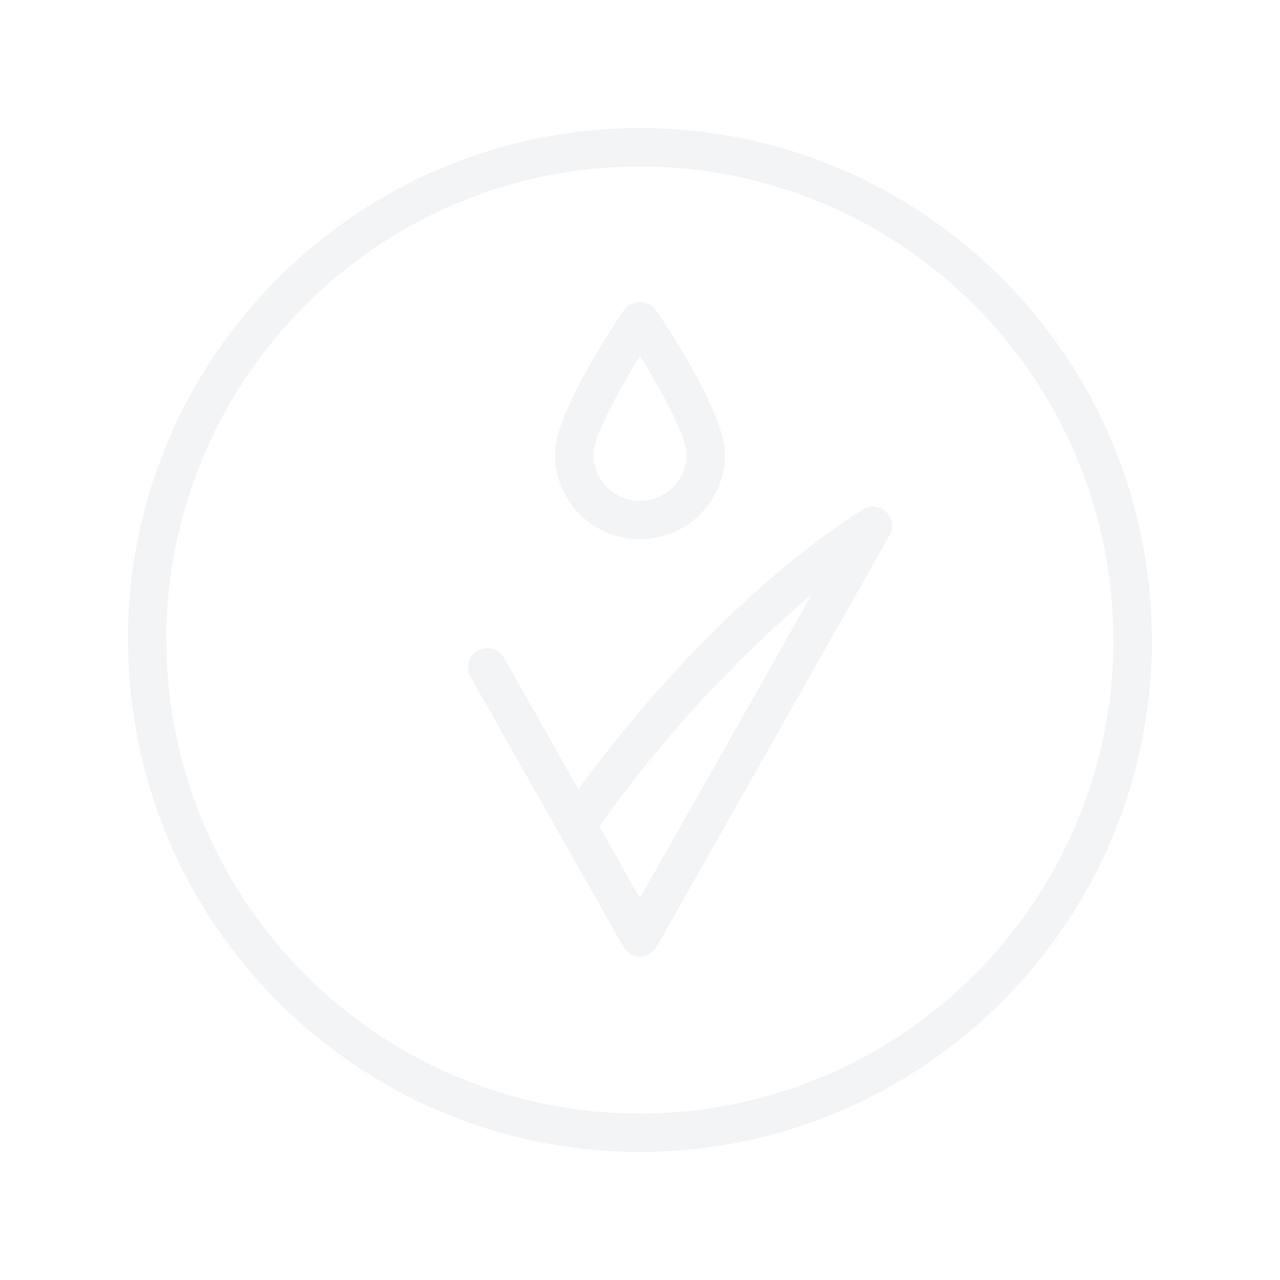 SCHWARZKOPF PROFESSIONAL Osis+ Boho Rebel Blond Dry Shampoo